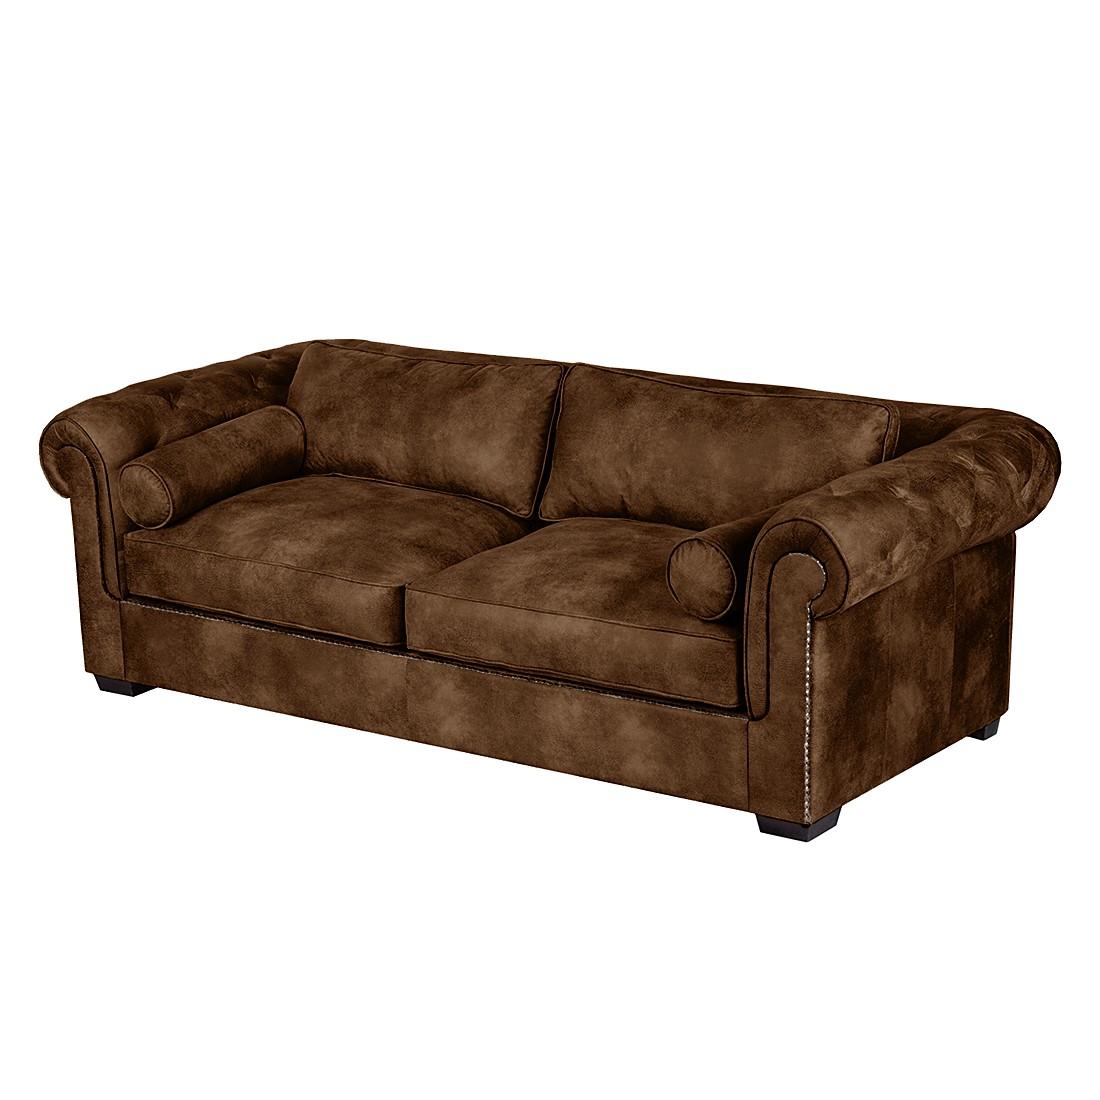 Sofa mallow 3 sitzer antiklederoptik braun furnlab online bestellen - Sofa antiklederoptik ...